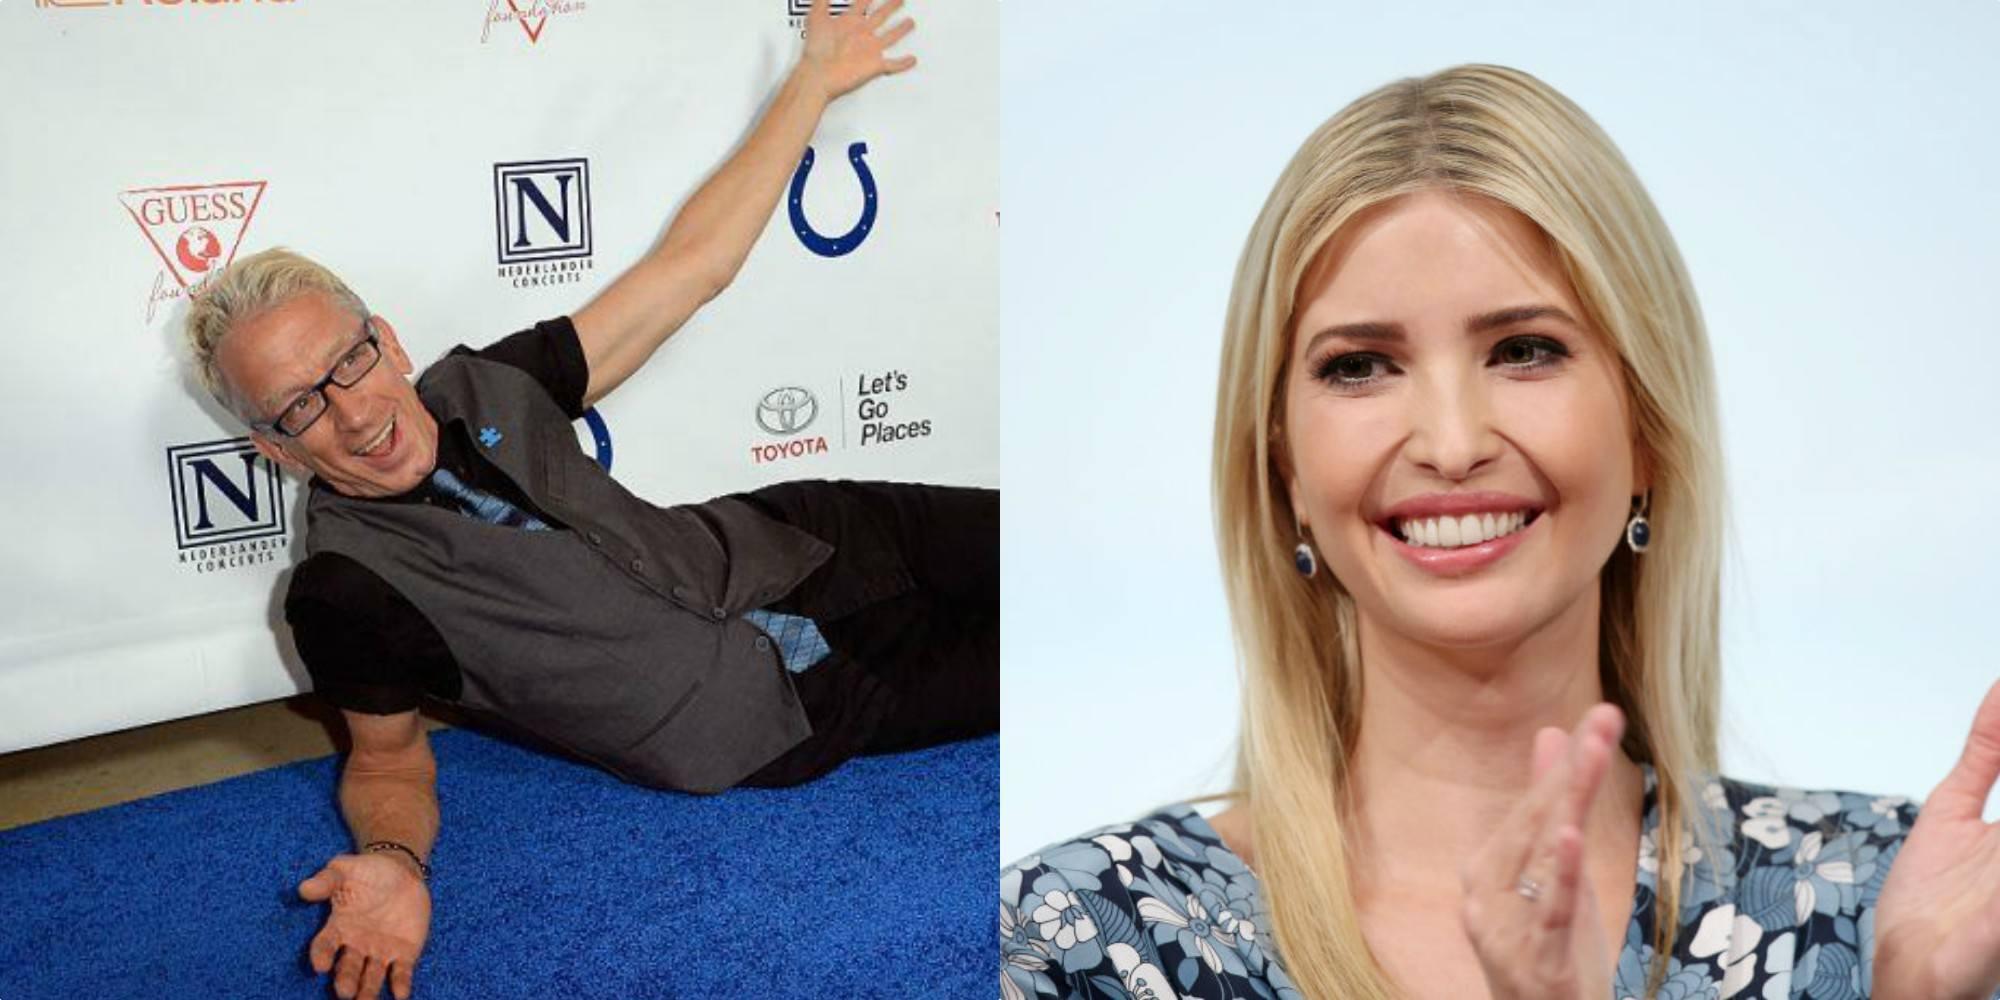 Andy Dick and Ivanka Trump